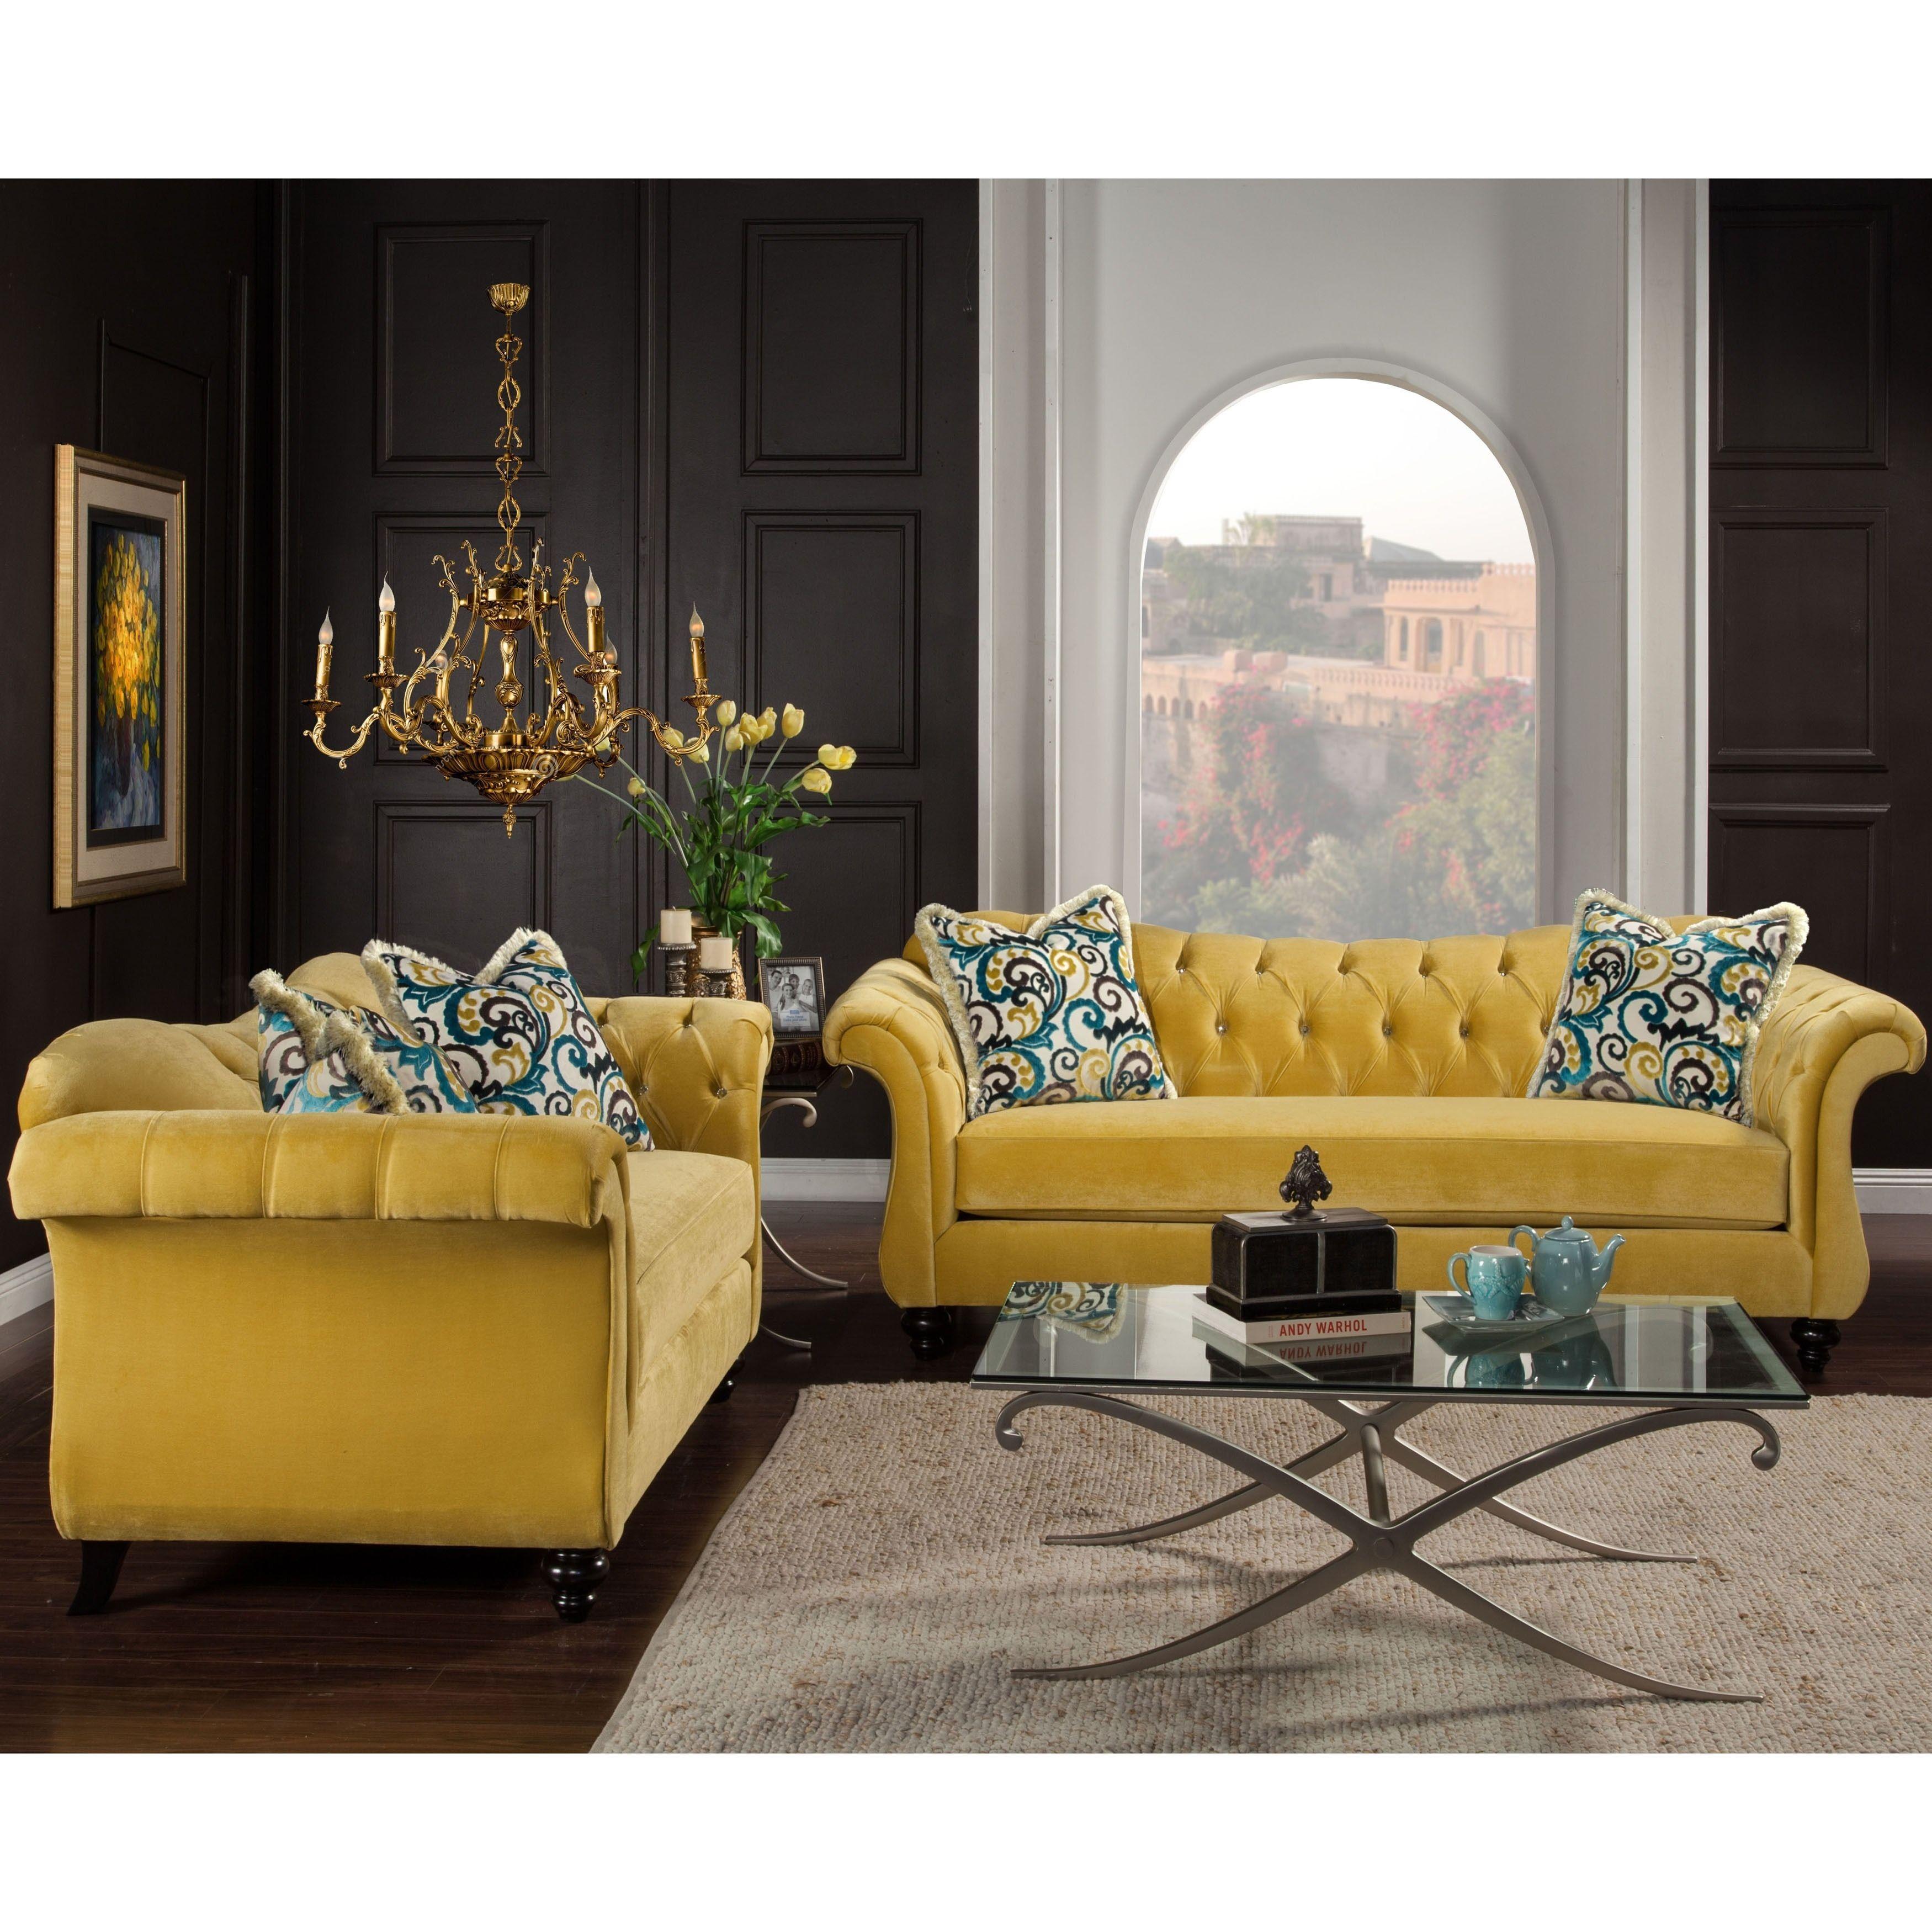 Stupendous Shop Our Biggest Ever Memorial Day Sale Sofas For My Home Spiritservingveterans Wood Chair Design Ideas Spiritservingveteransorg